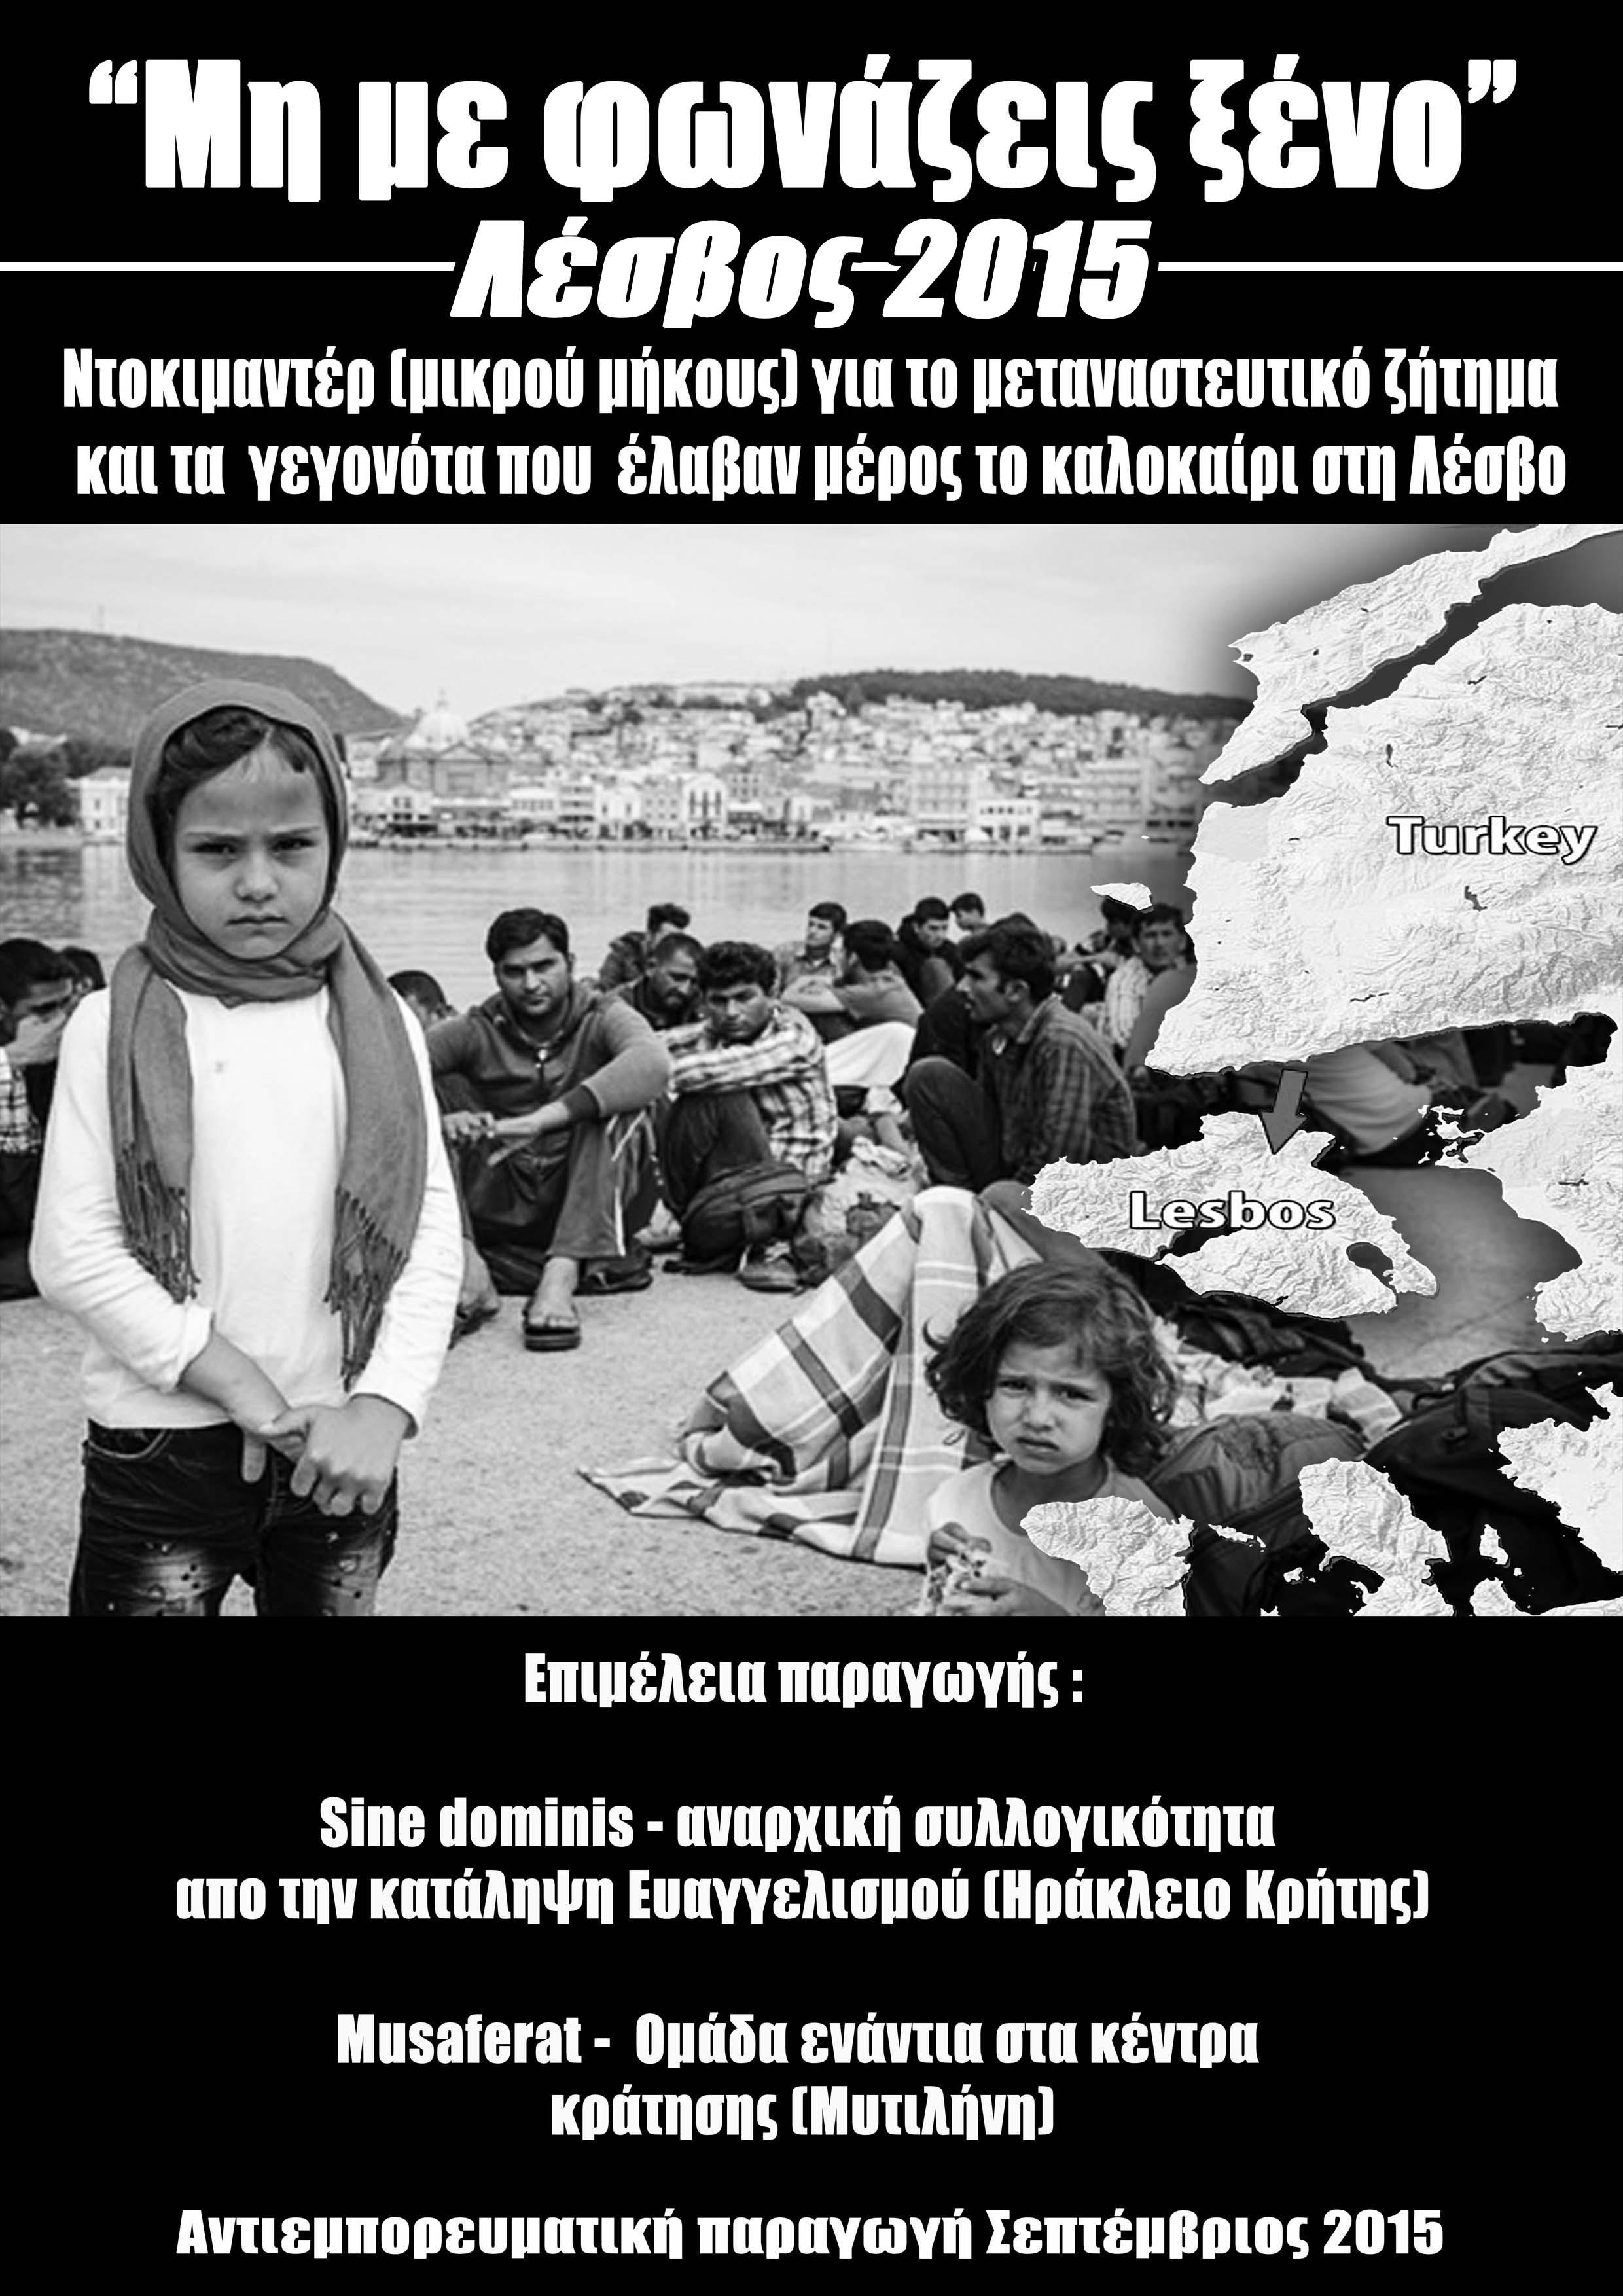 https://evagelismos.squat.gr/files/2015/09/poster-A4.jpg